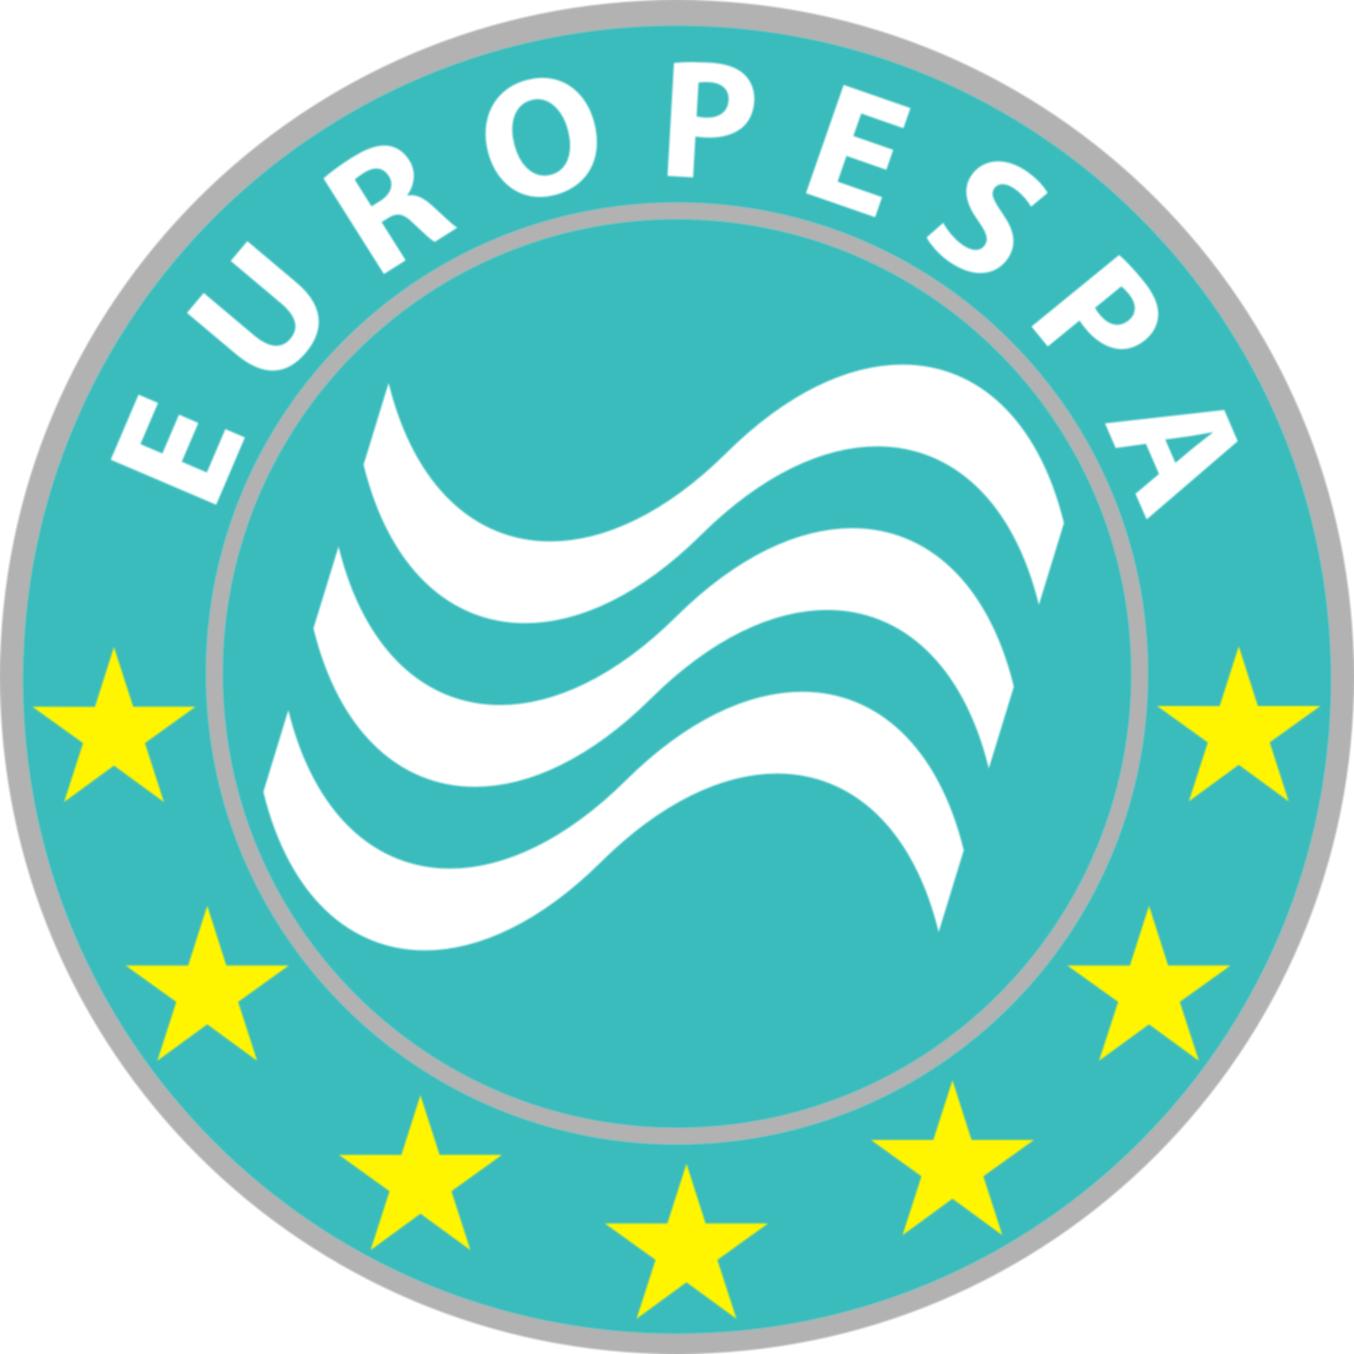 Eurospa_okrągły